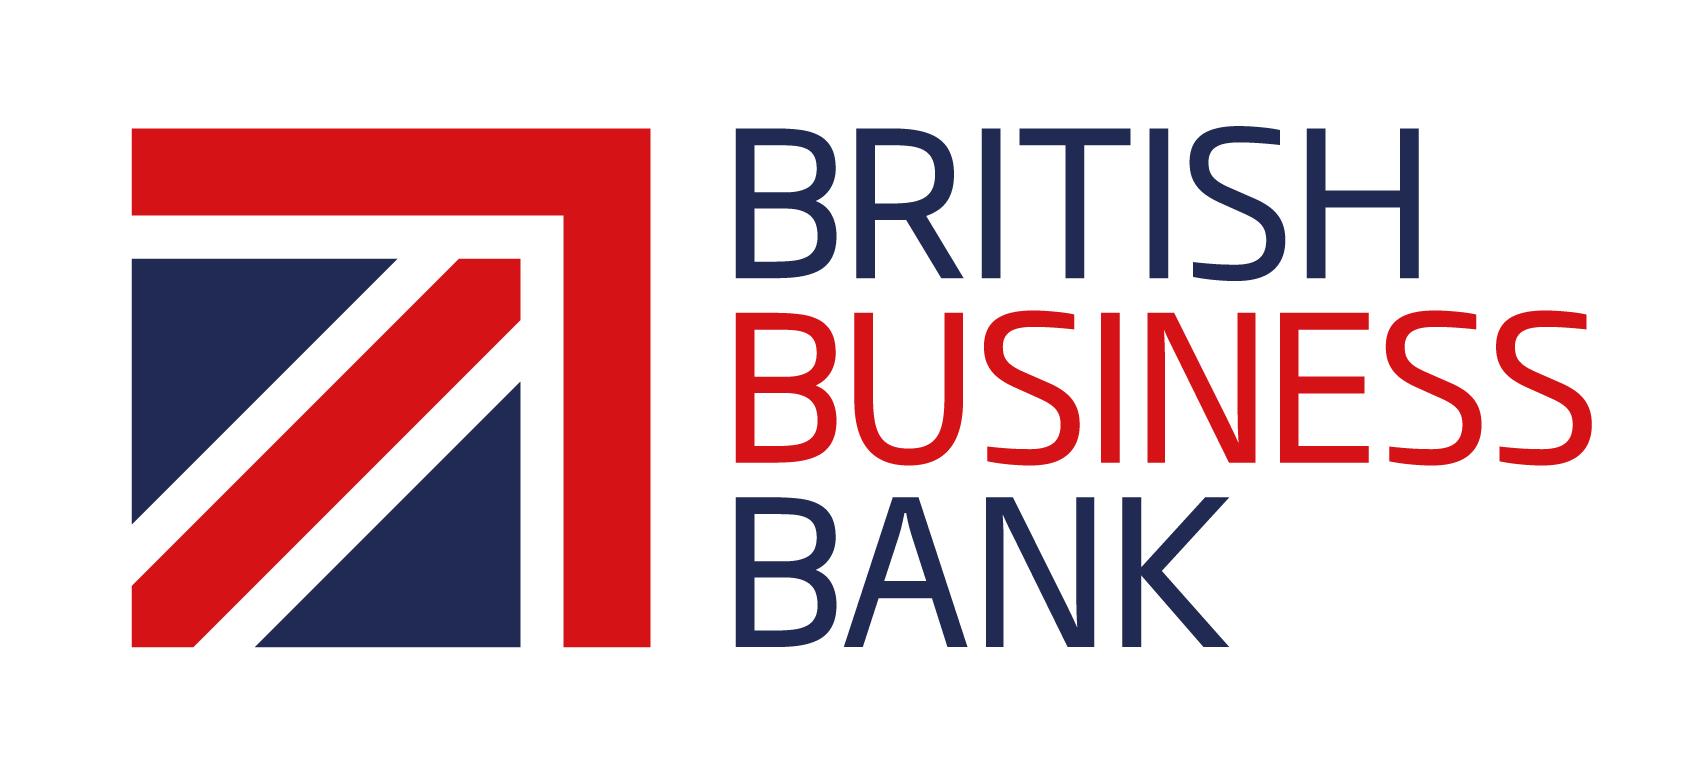 Coronavirus Business Interruption Loan Scheme- British Business Bank